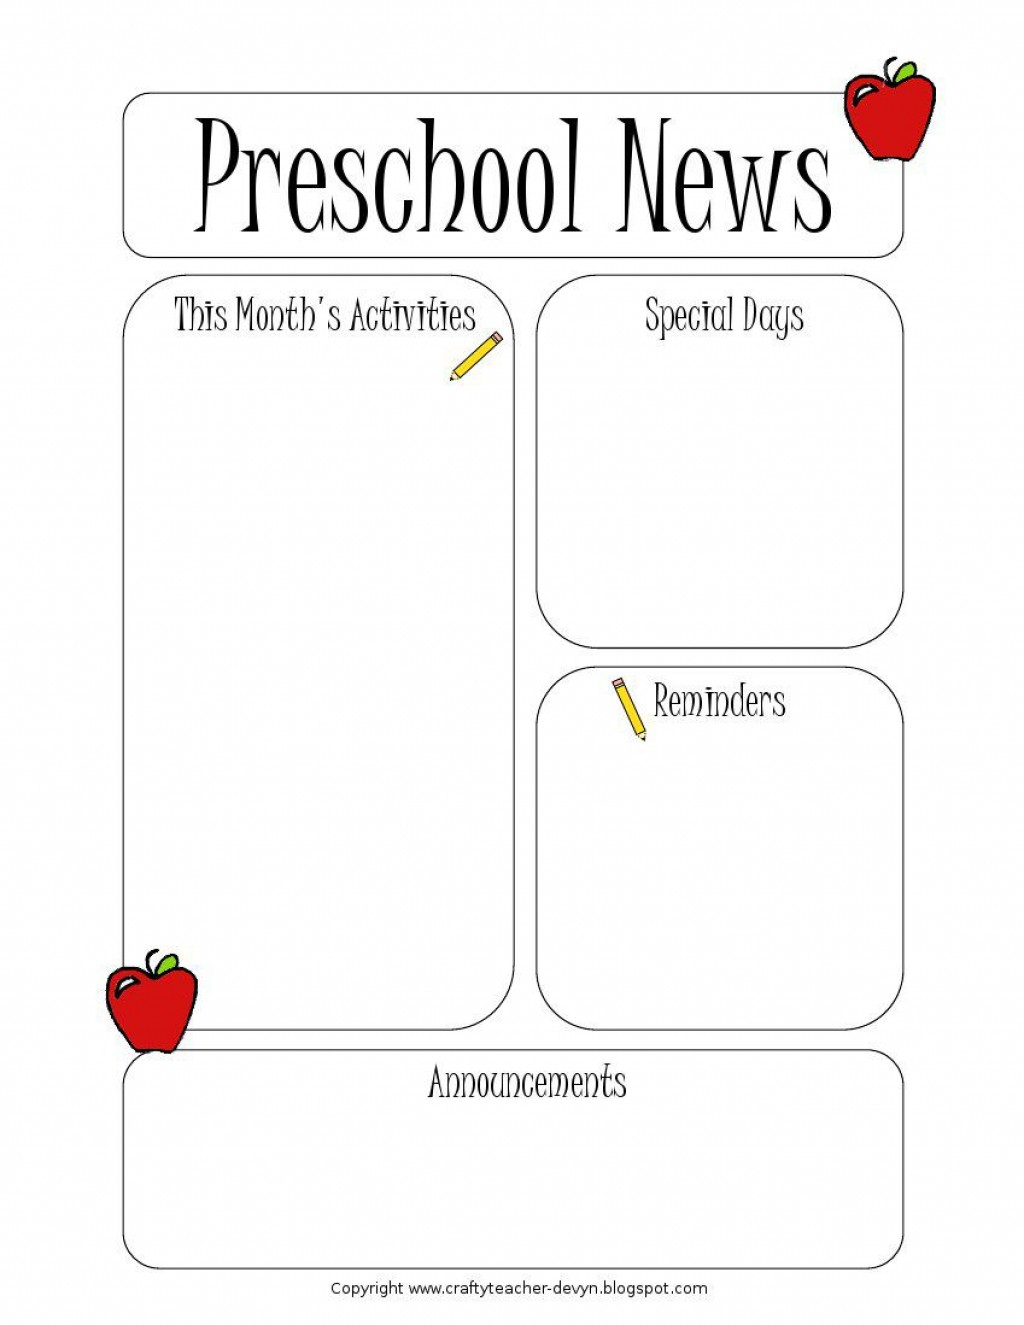 005 Wondrou Newsletter Template For Teacher Inspiration  Teachers To Parent Free Printable DigitalLarge